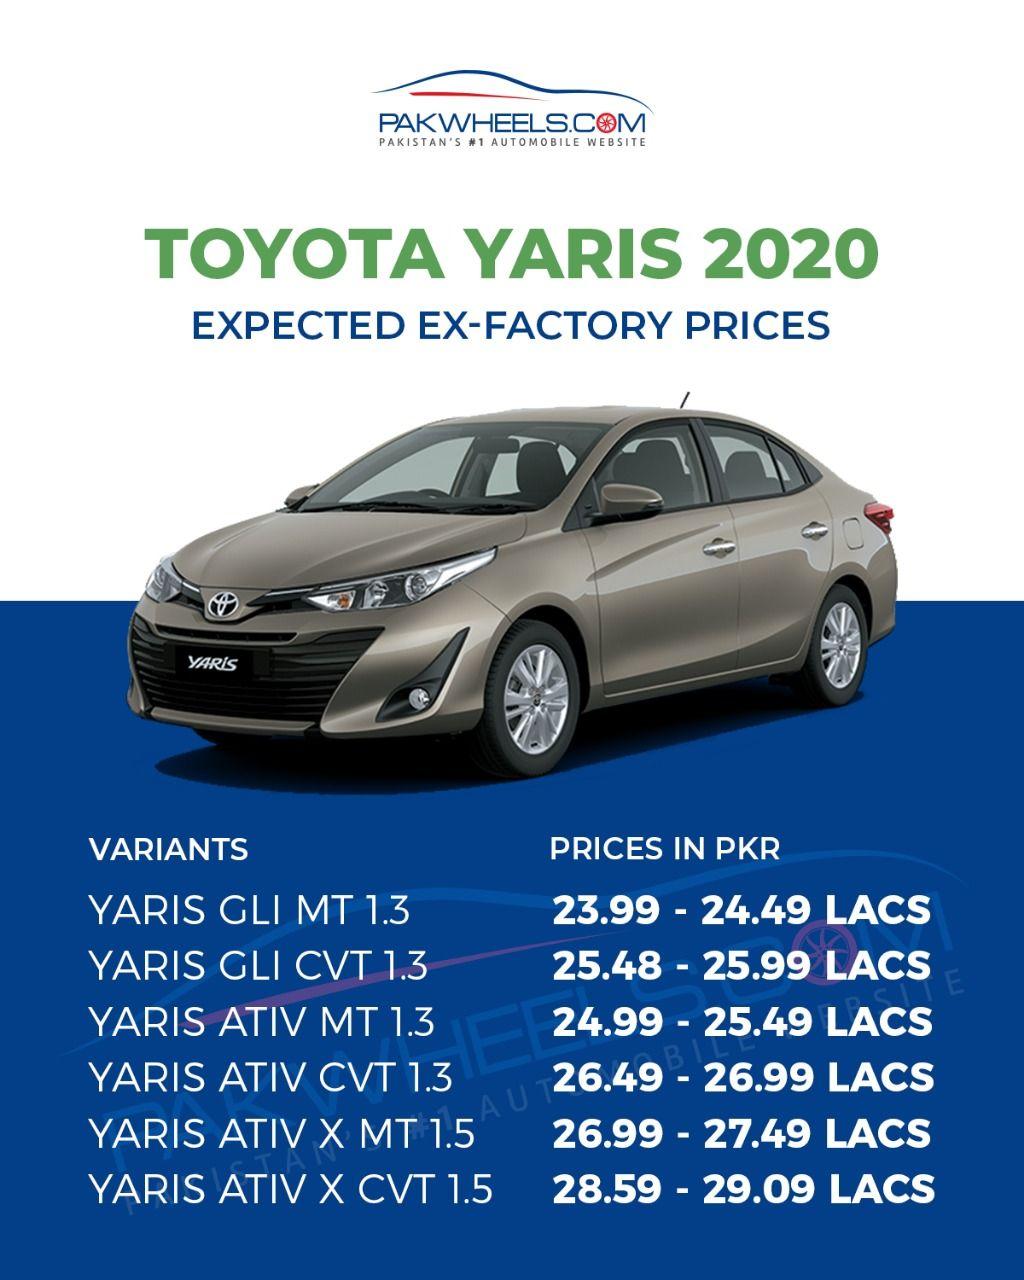 The mostawaited Toyota Yaris is just around the corner